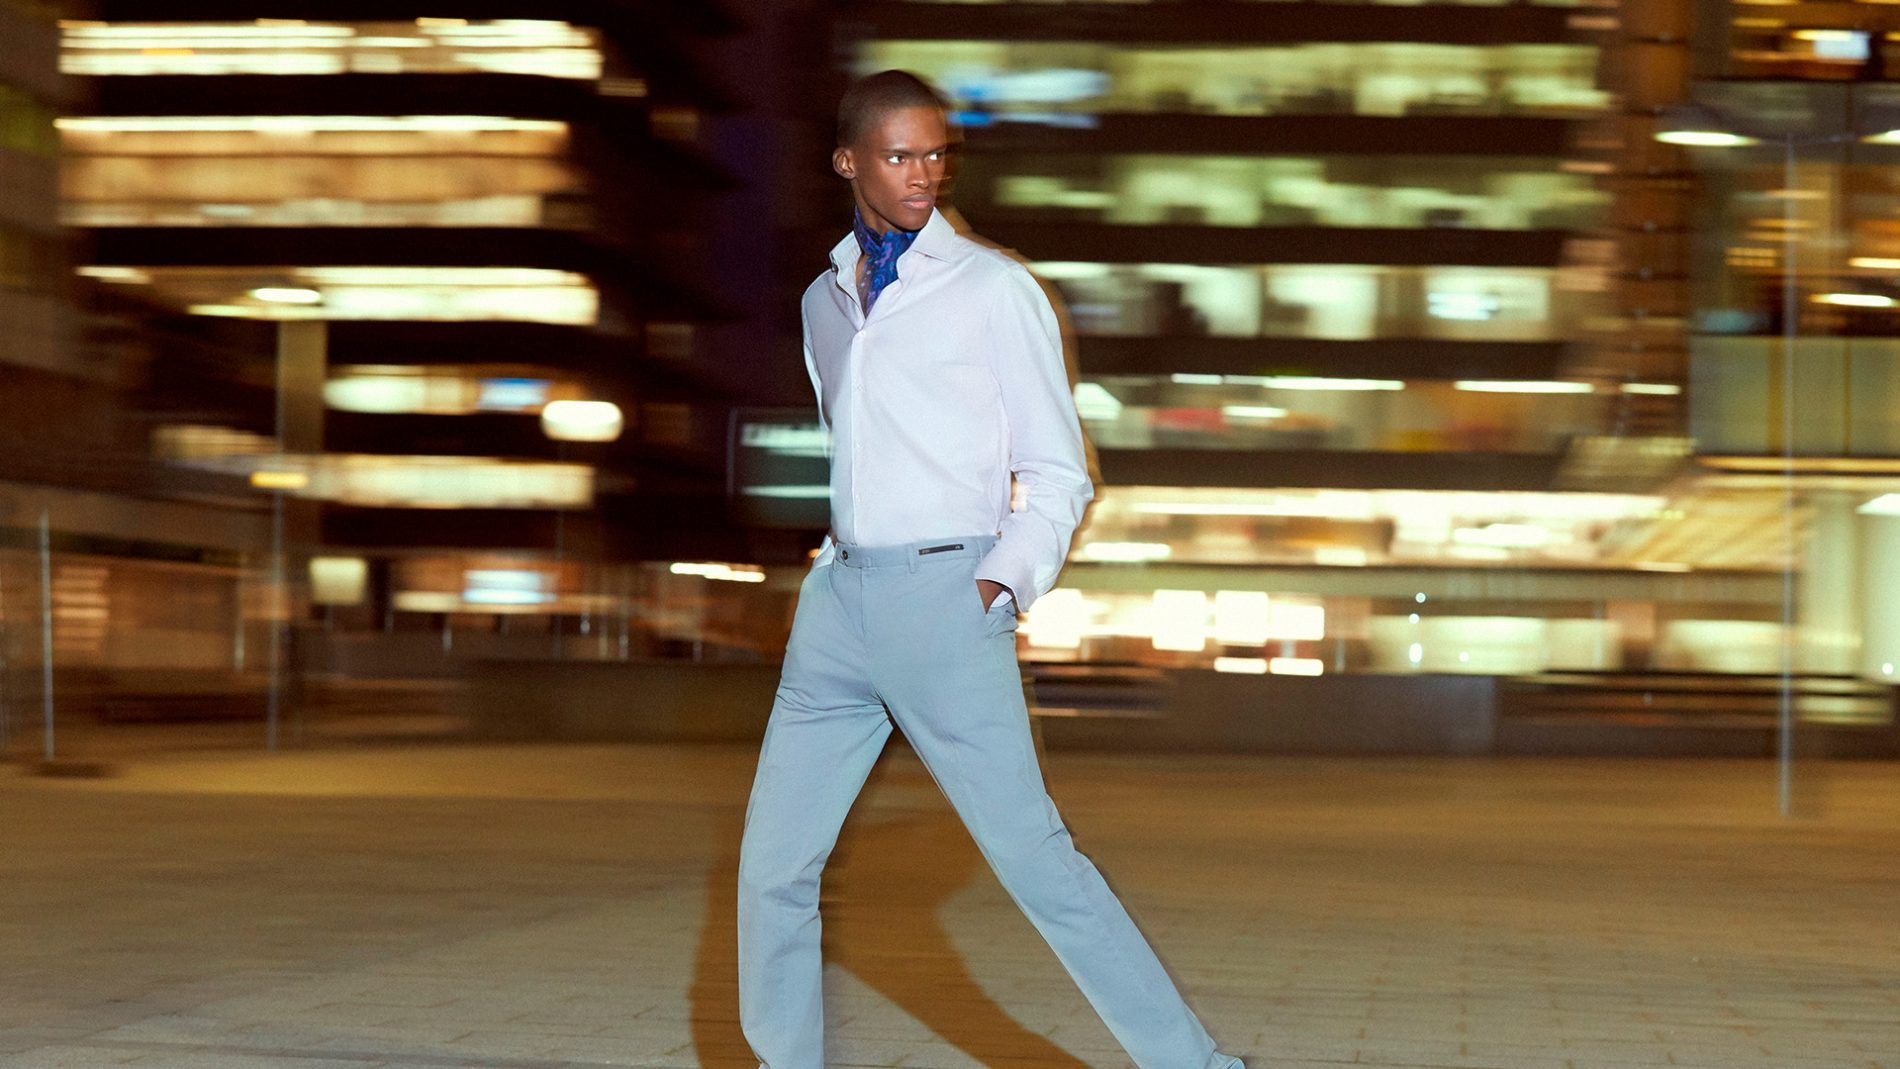 El Corte Inglés Designer Menswear Tailored Clothing Etro Corneliani